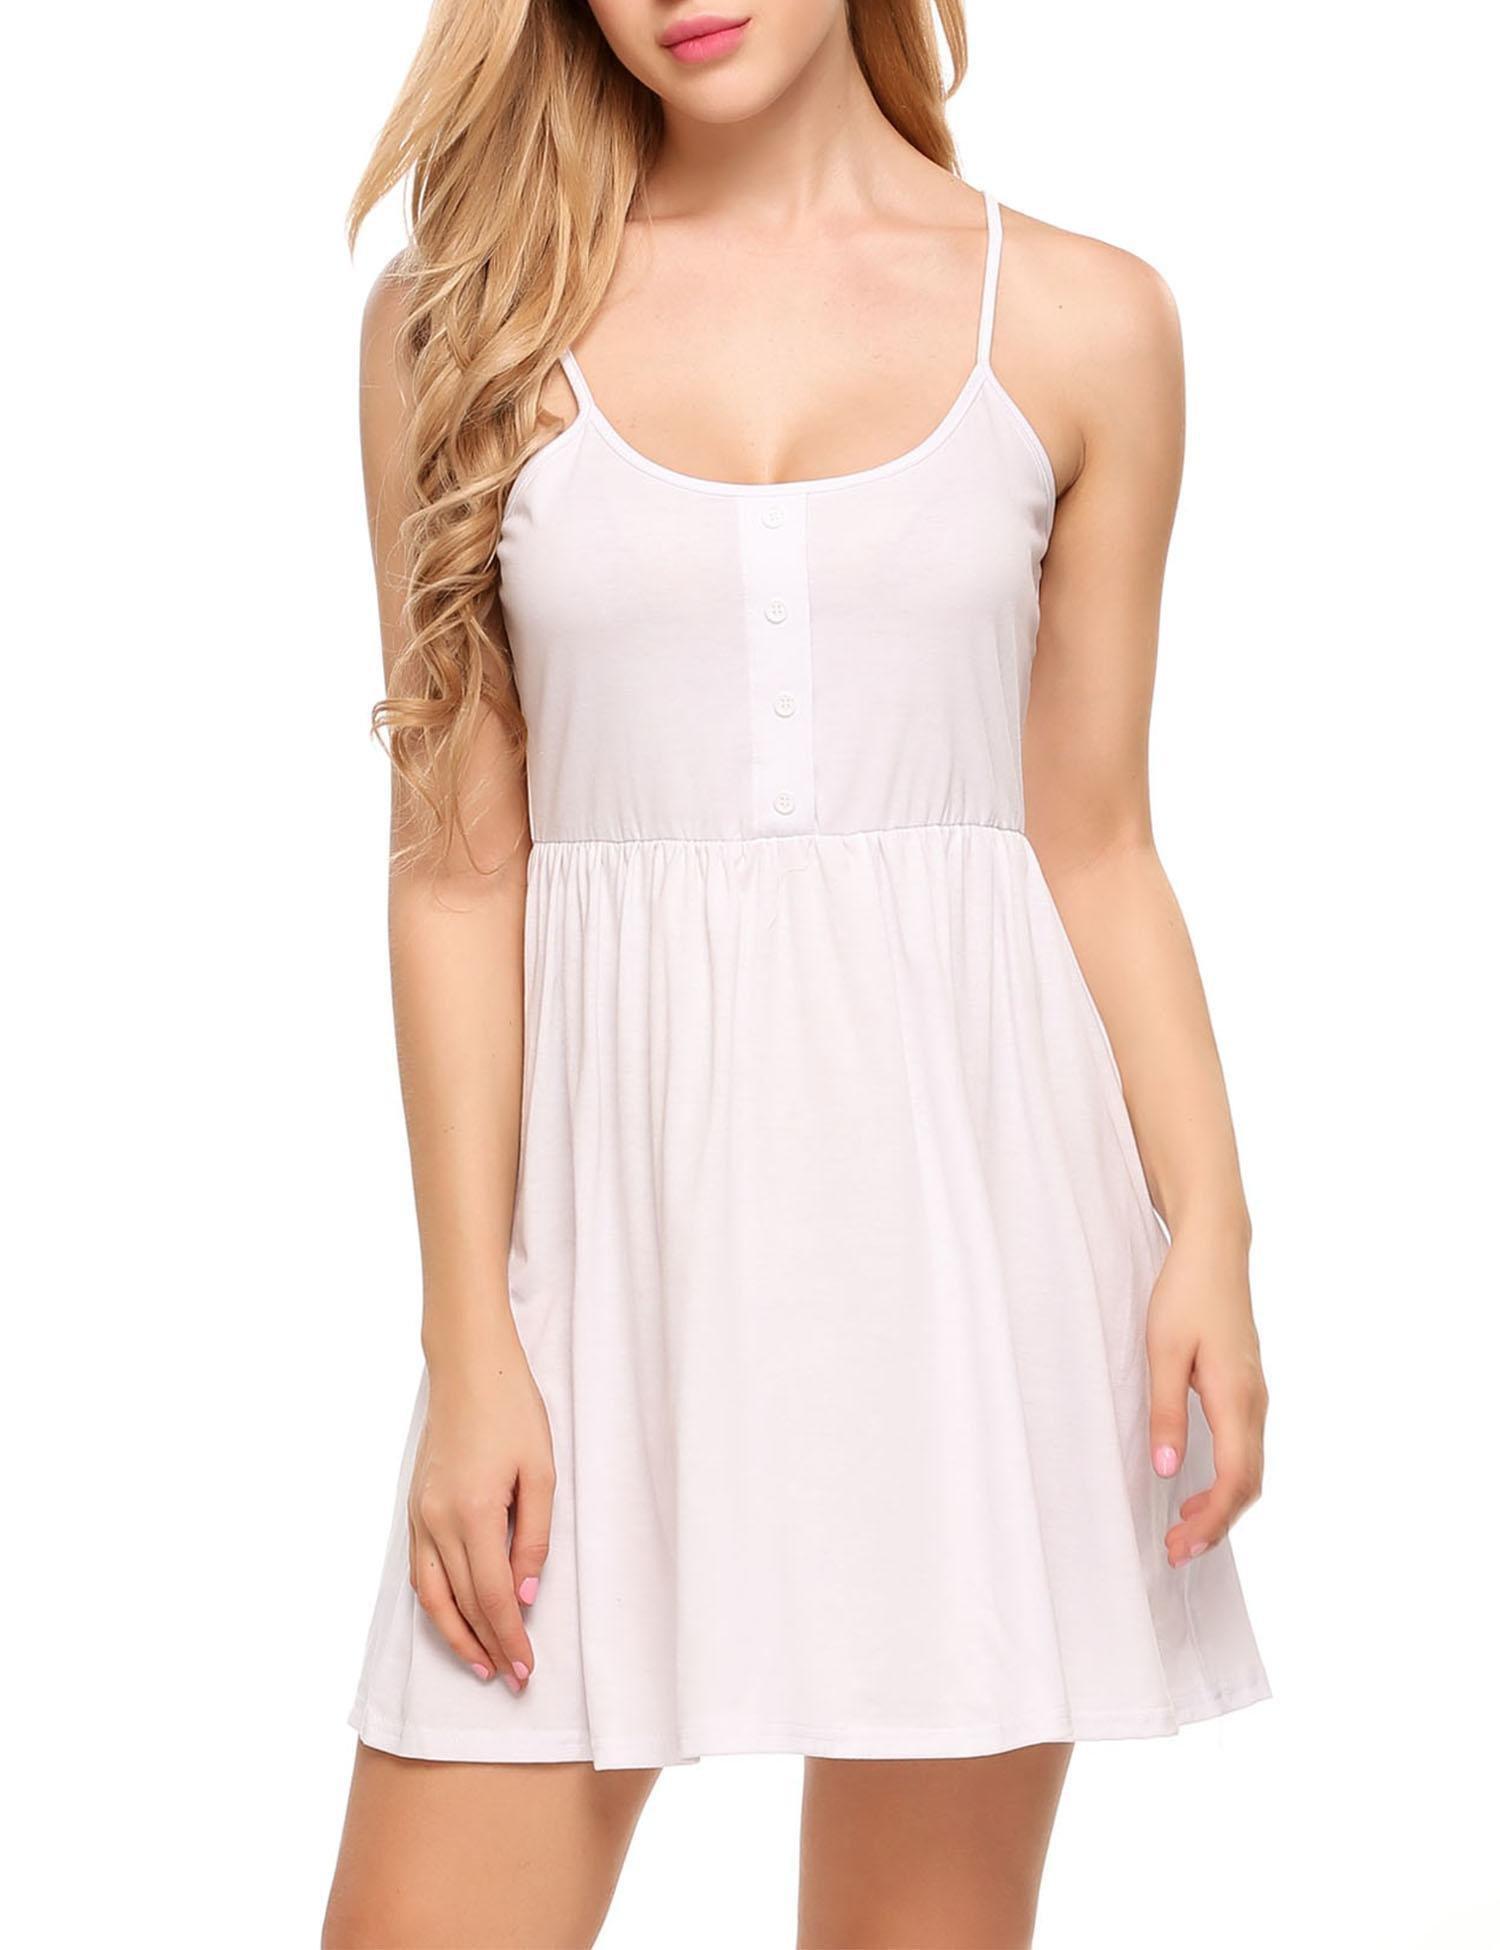 Beyove Girls Jersey Camisole Short Tank Top Spaghetti Strap Mini Dress (White, Small)